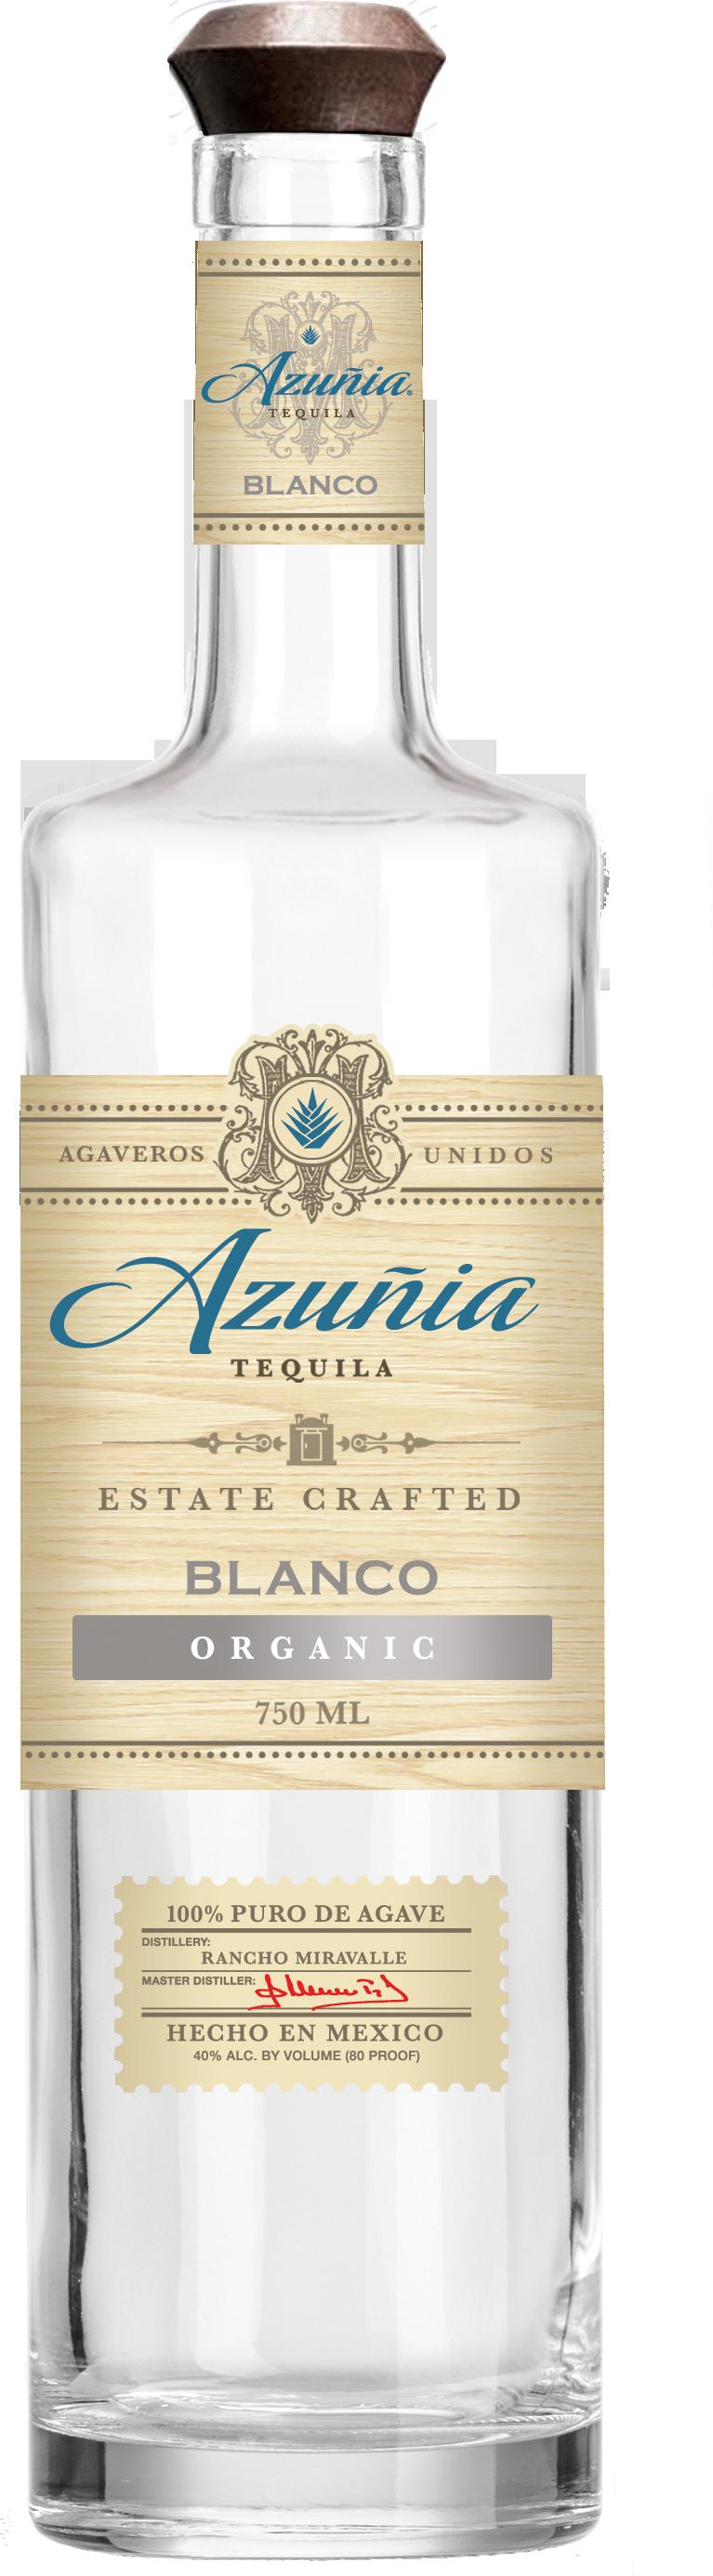 Blanco Tequila (Organic)